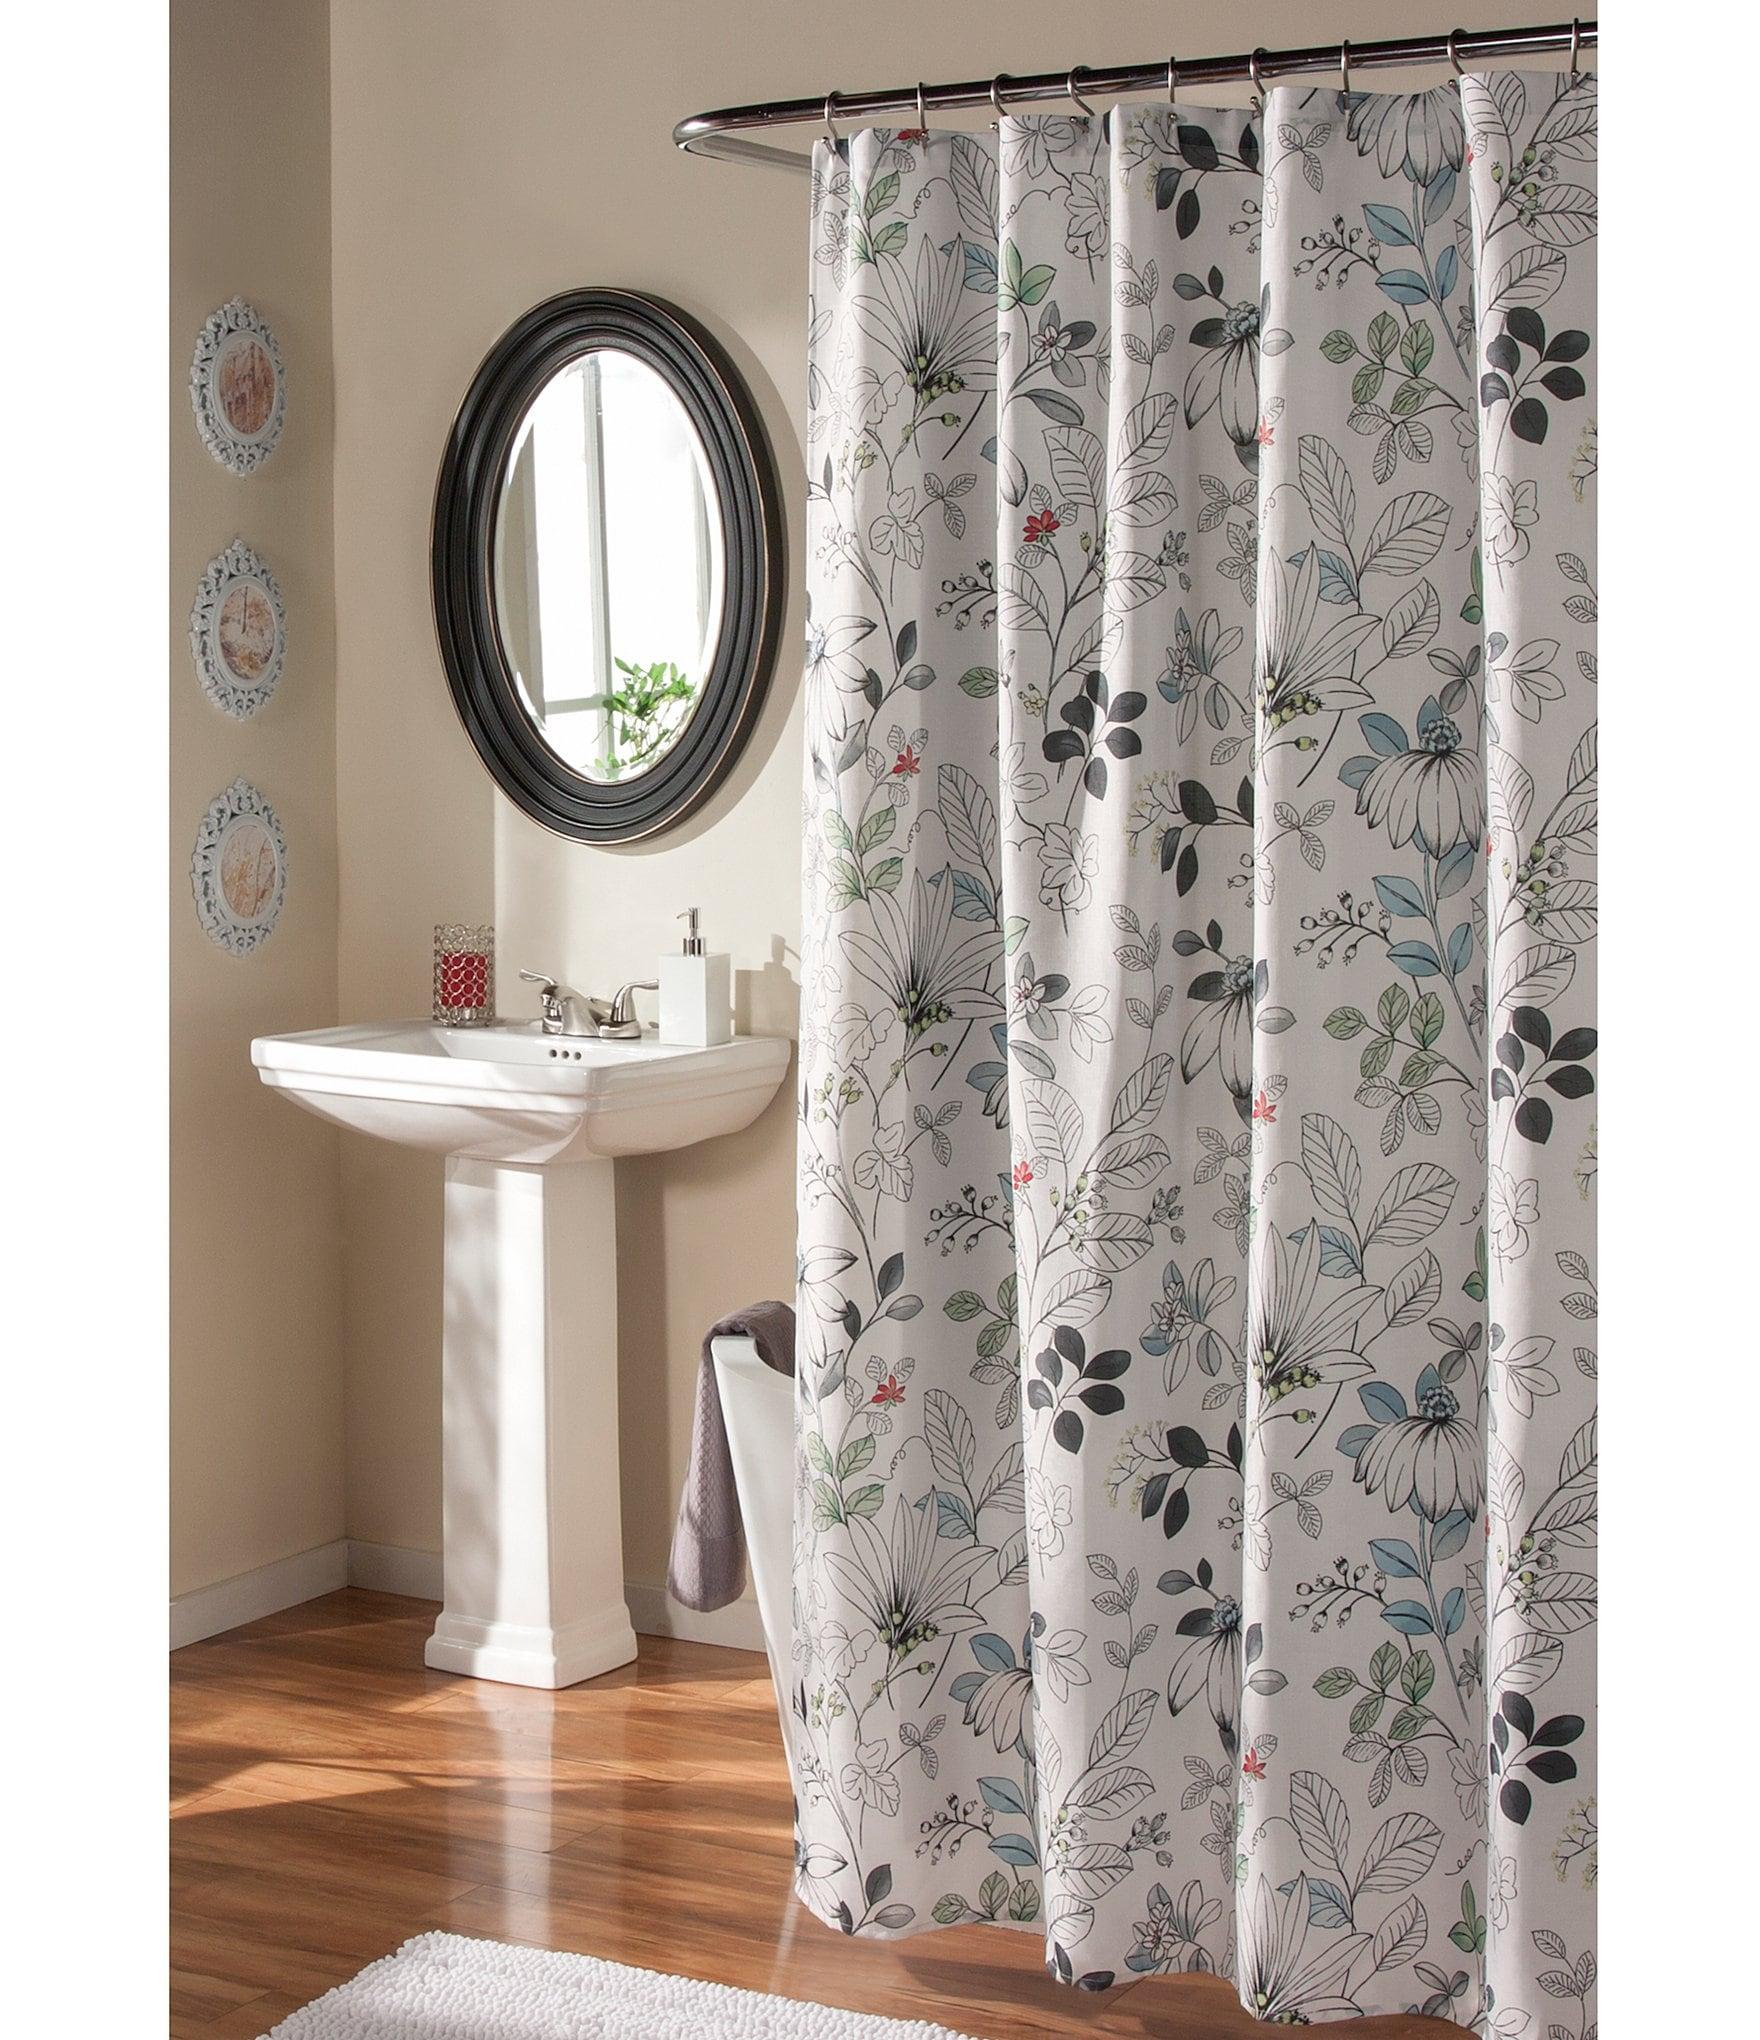 Home Bath  Personal Care Shower Curtains  Rings Dillardscom - Burgundy shower curtain sets